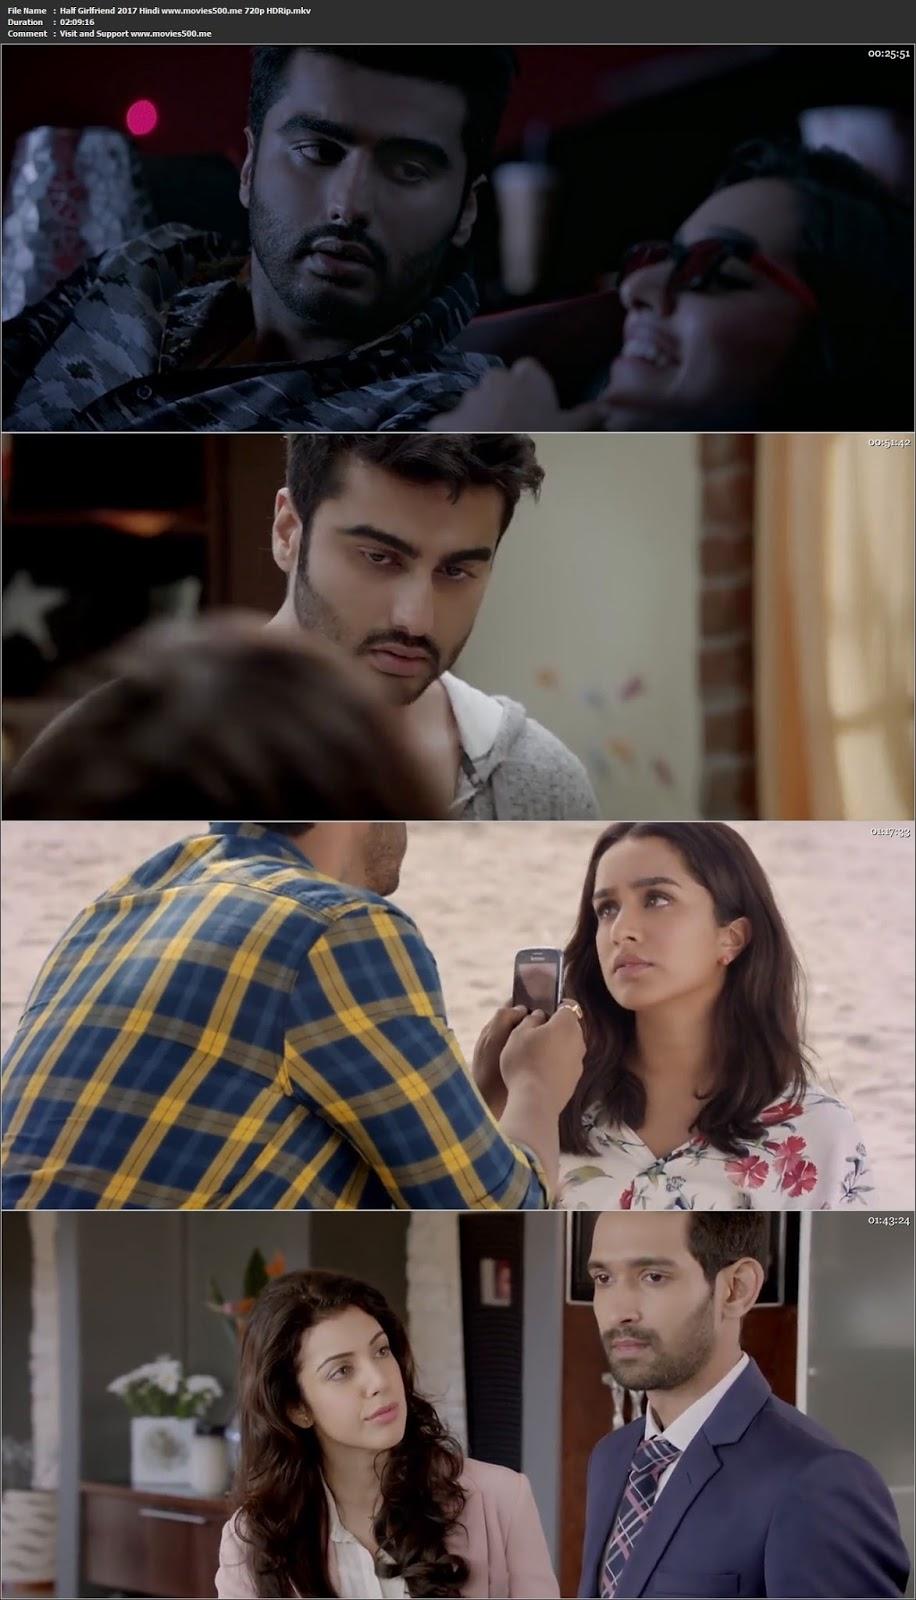 Half Girlfriend 2017 Full Movie Hindi HDRip 720p at newbtcbank.com